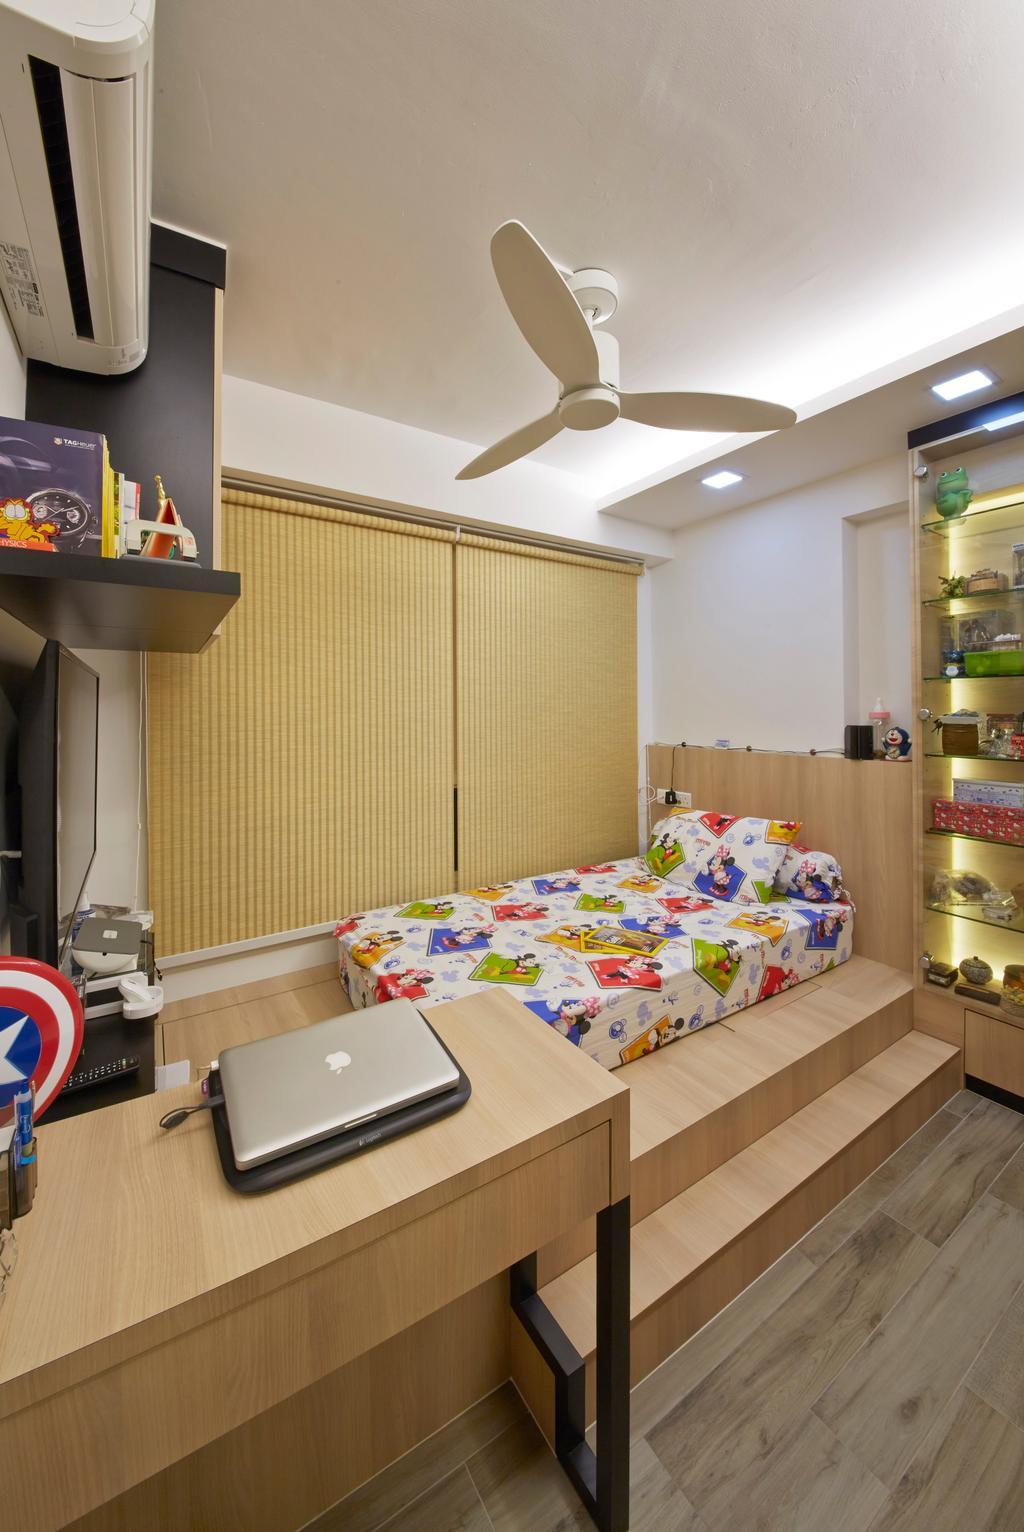 Hdb Study Room Design Ideas: Interior Design Singapore